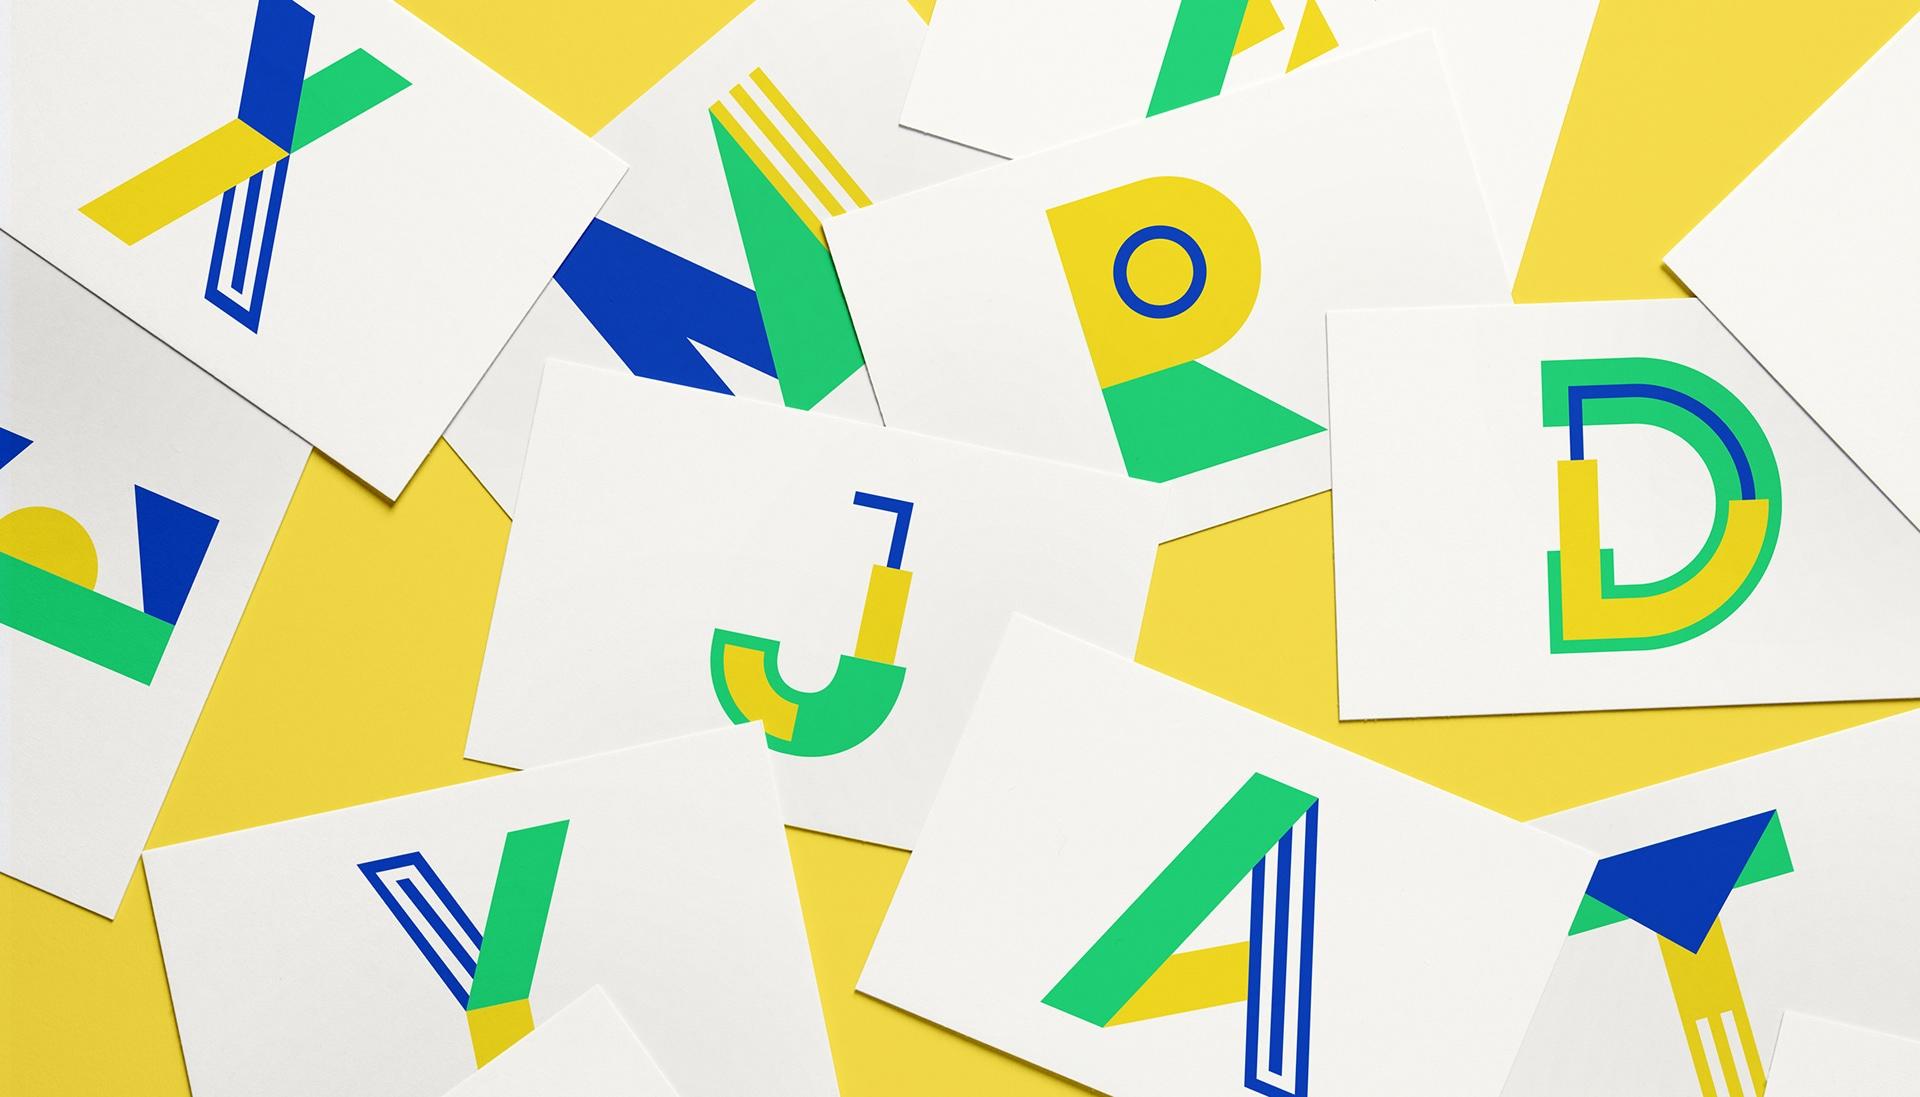 Metra创意现代设计logo色彩英文字体下载